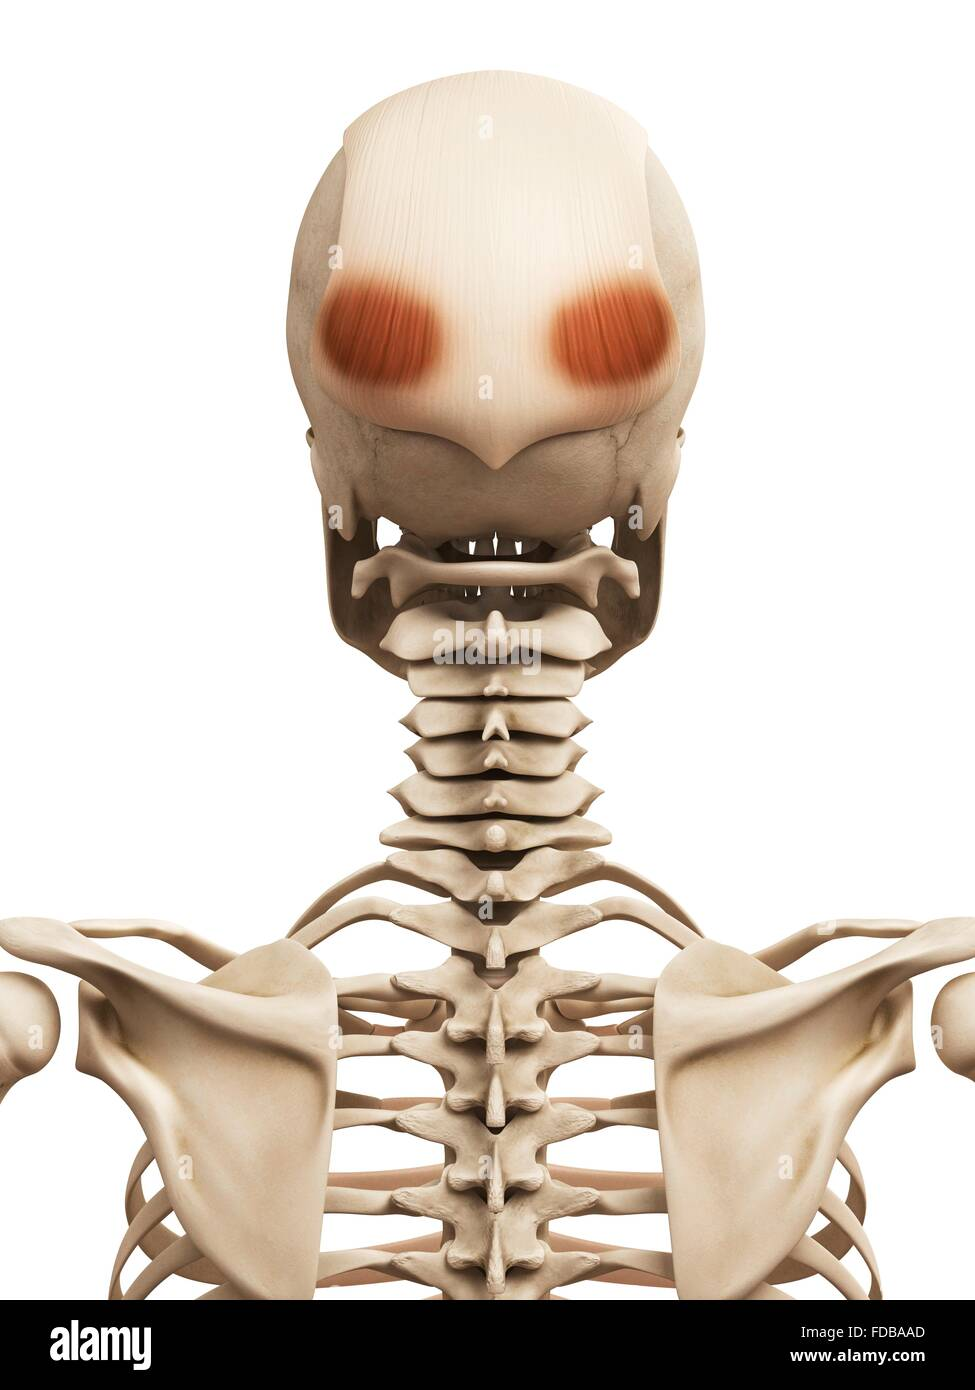 Berühmt Menschliche Muskelpartien Ideen - Anatomie Ideen - finotti.info